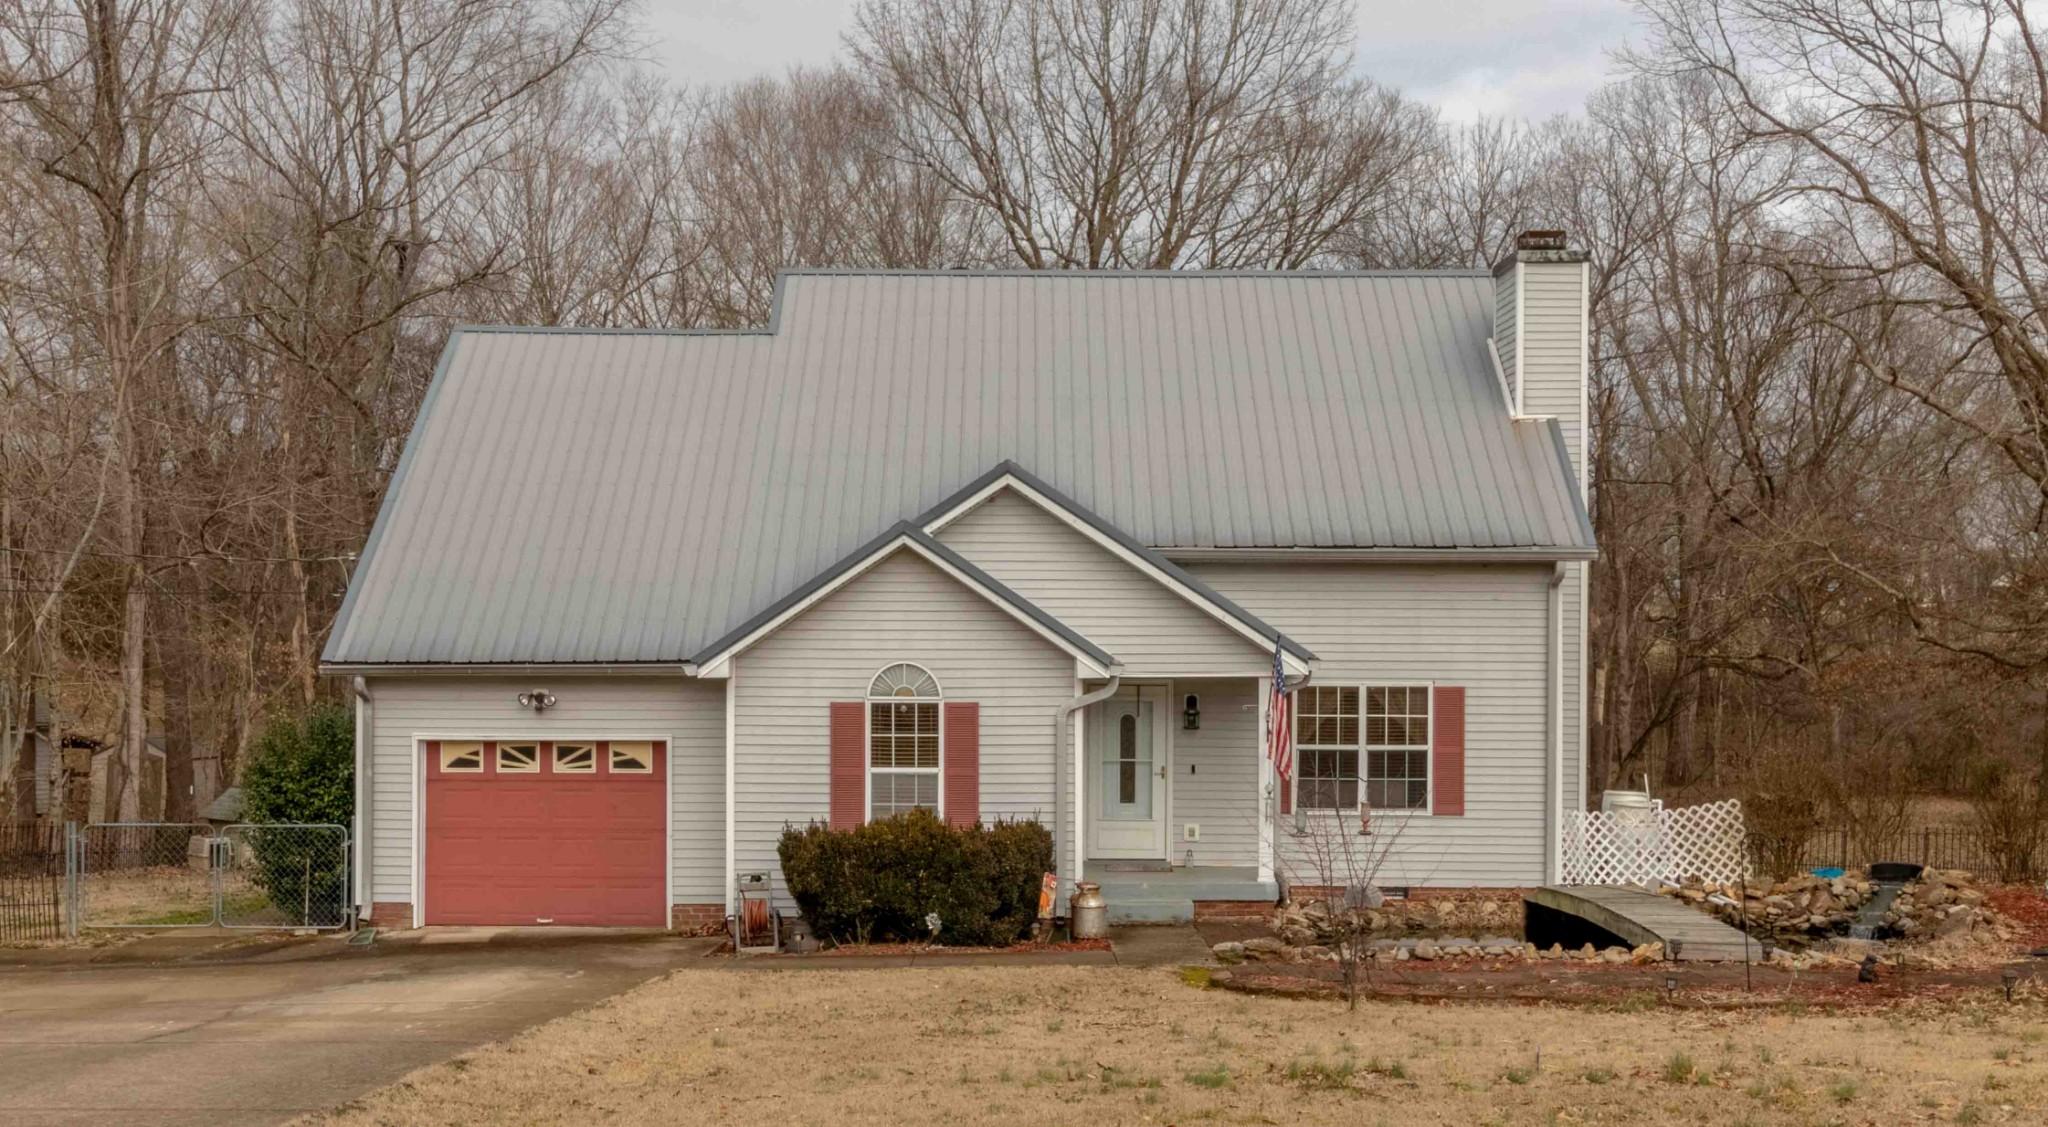 4049 Sawmill Rd Property Photo - Woodlawn, TN real estate listing